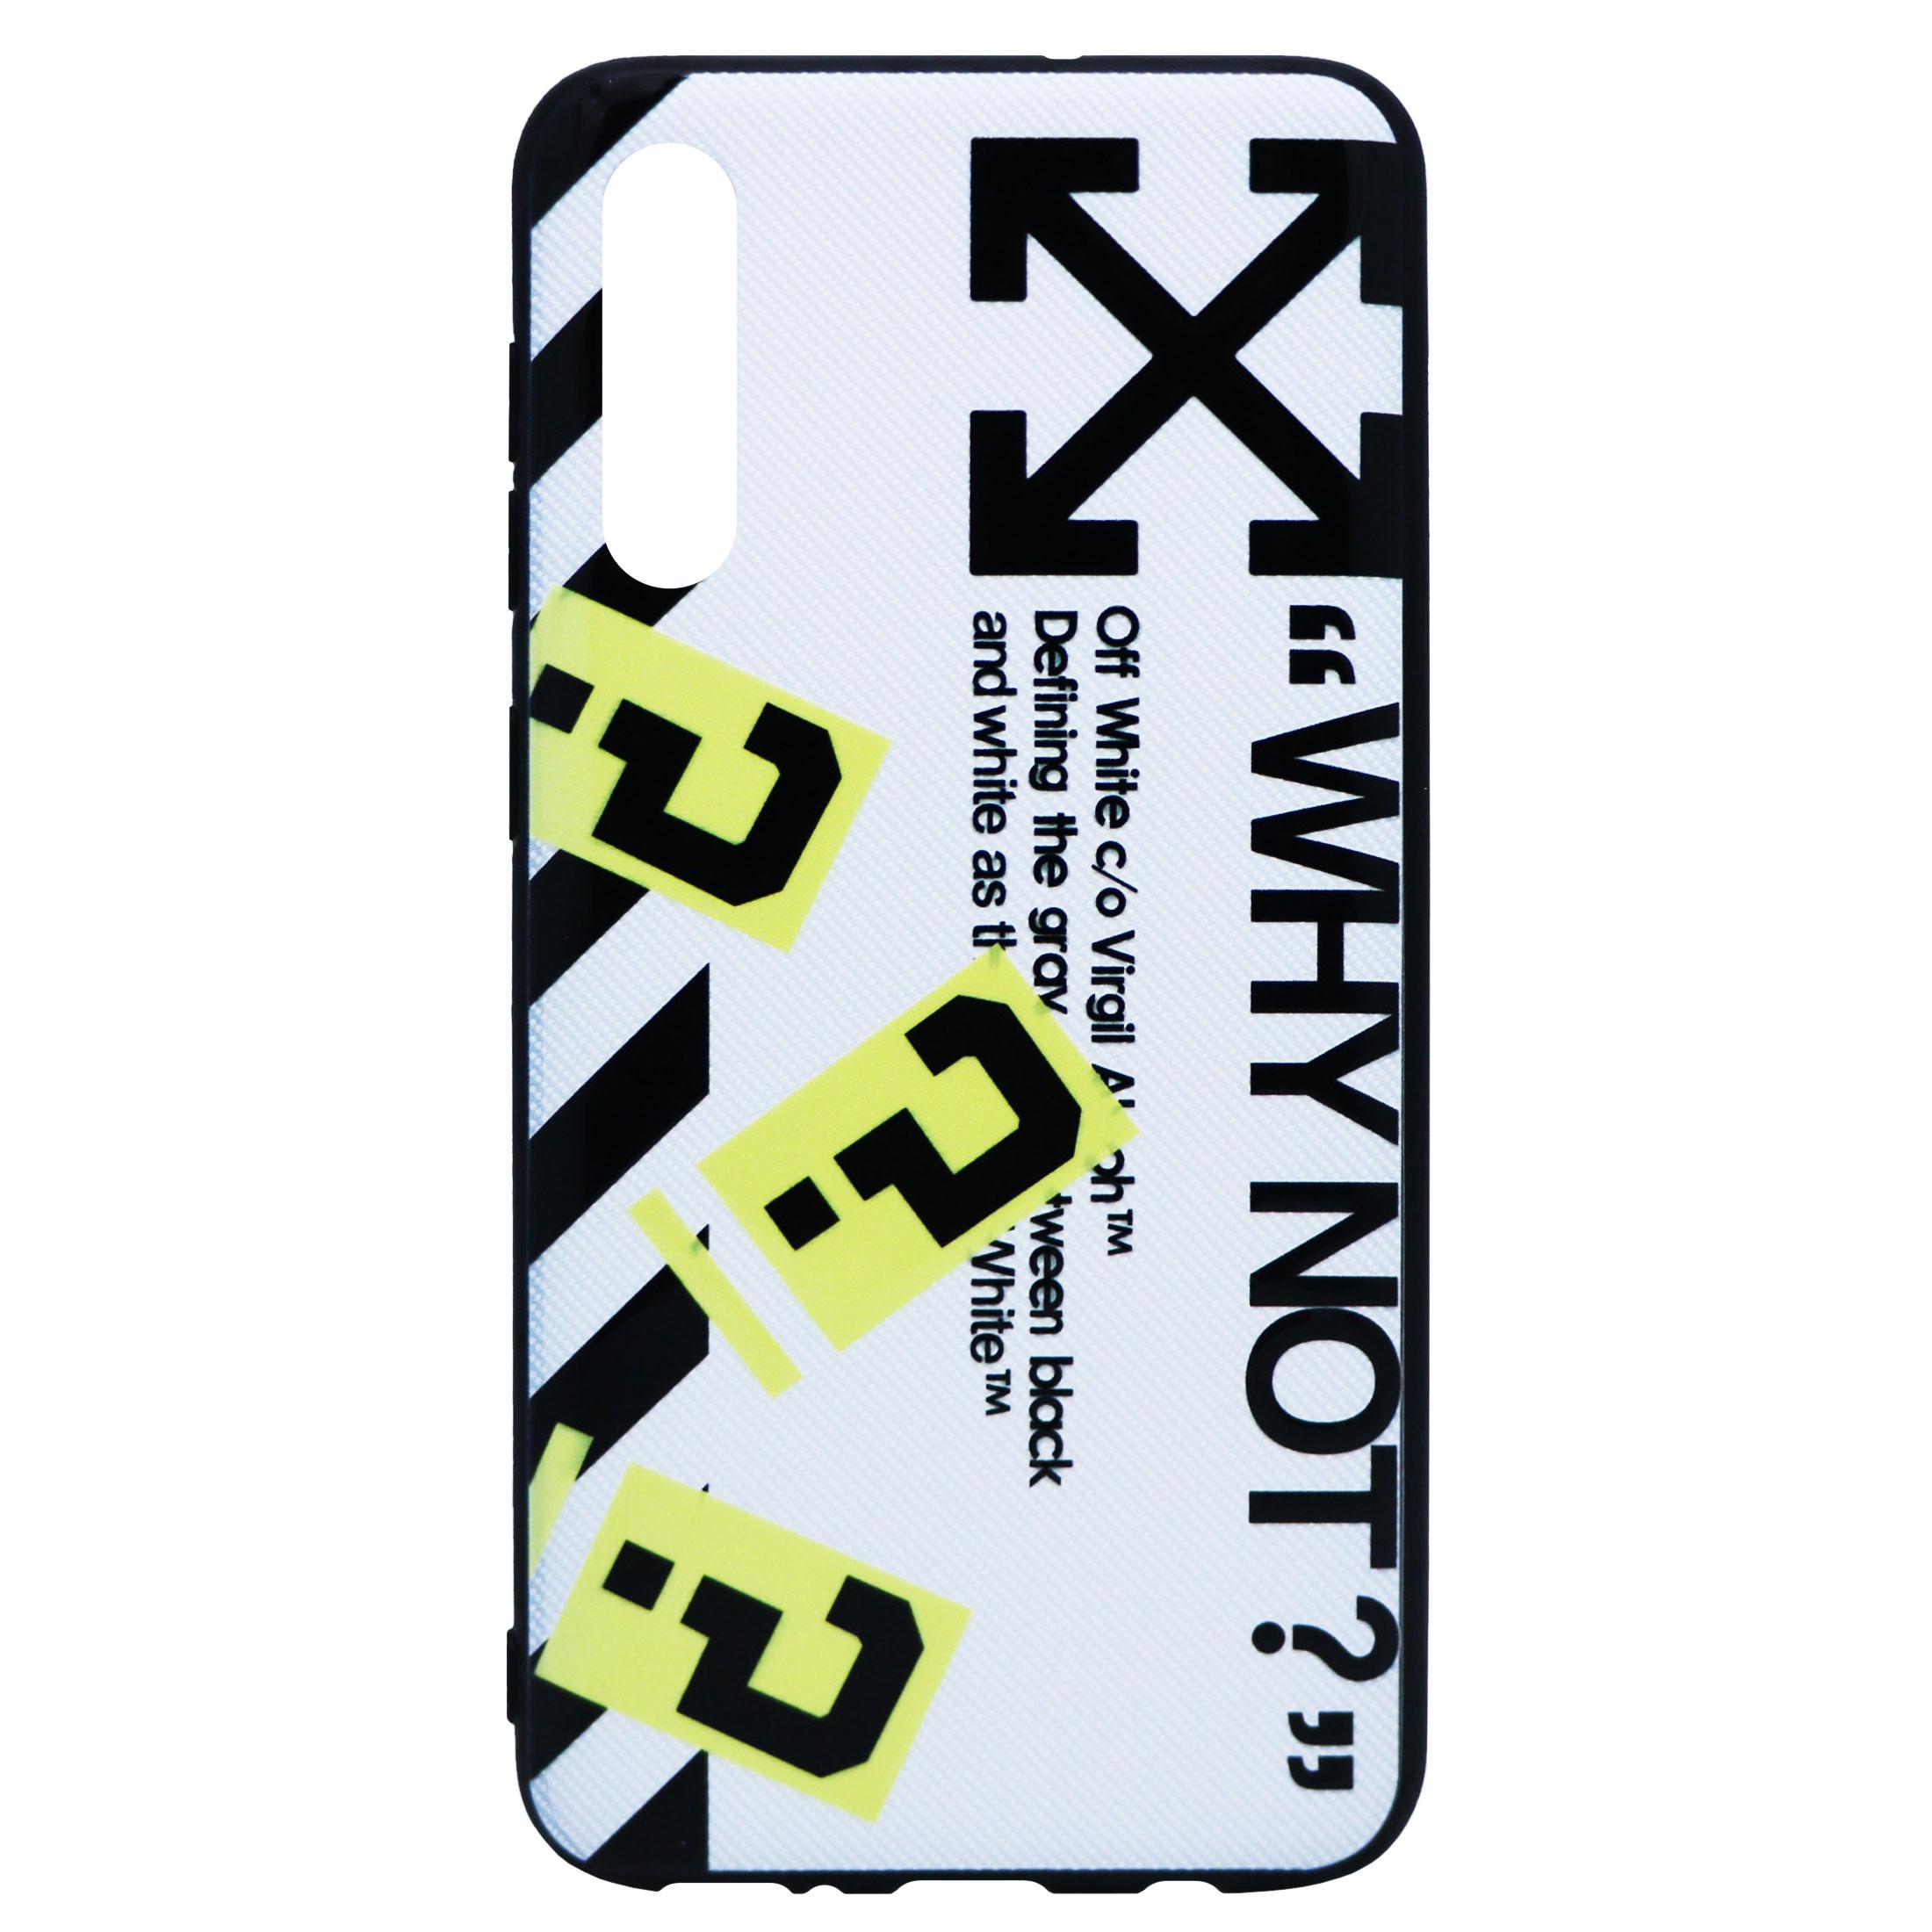 کاور طرح Why Not مدل SS-01 مناسب برای گوشی موبایل سامسونگ  Galaxy A50/A50s/A30s main 1 1